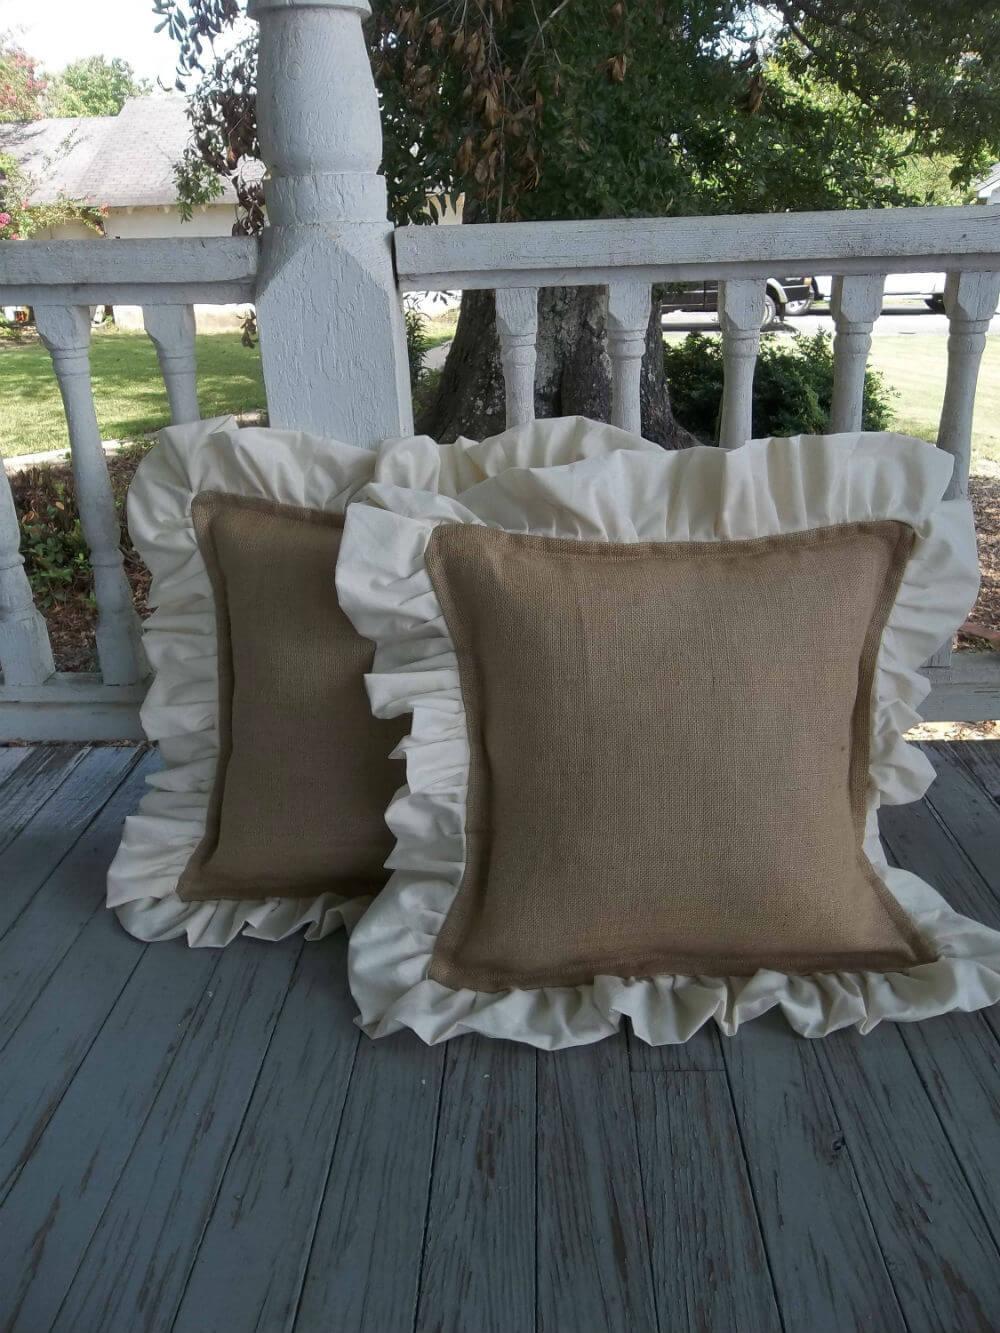 White Ruffled Burlap Decor Pillow Covers